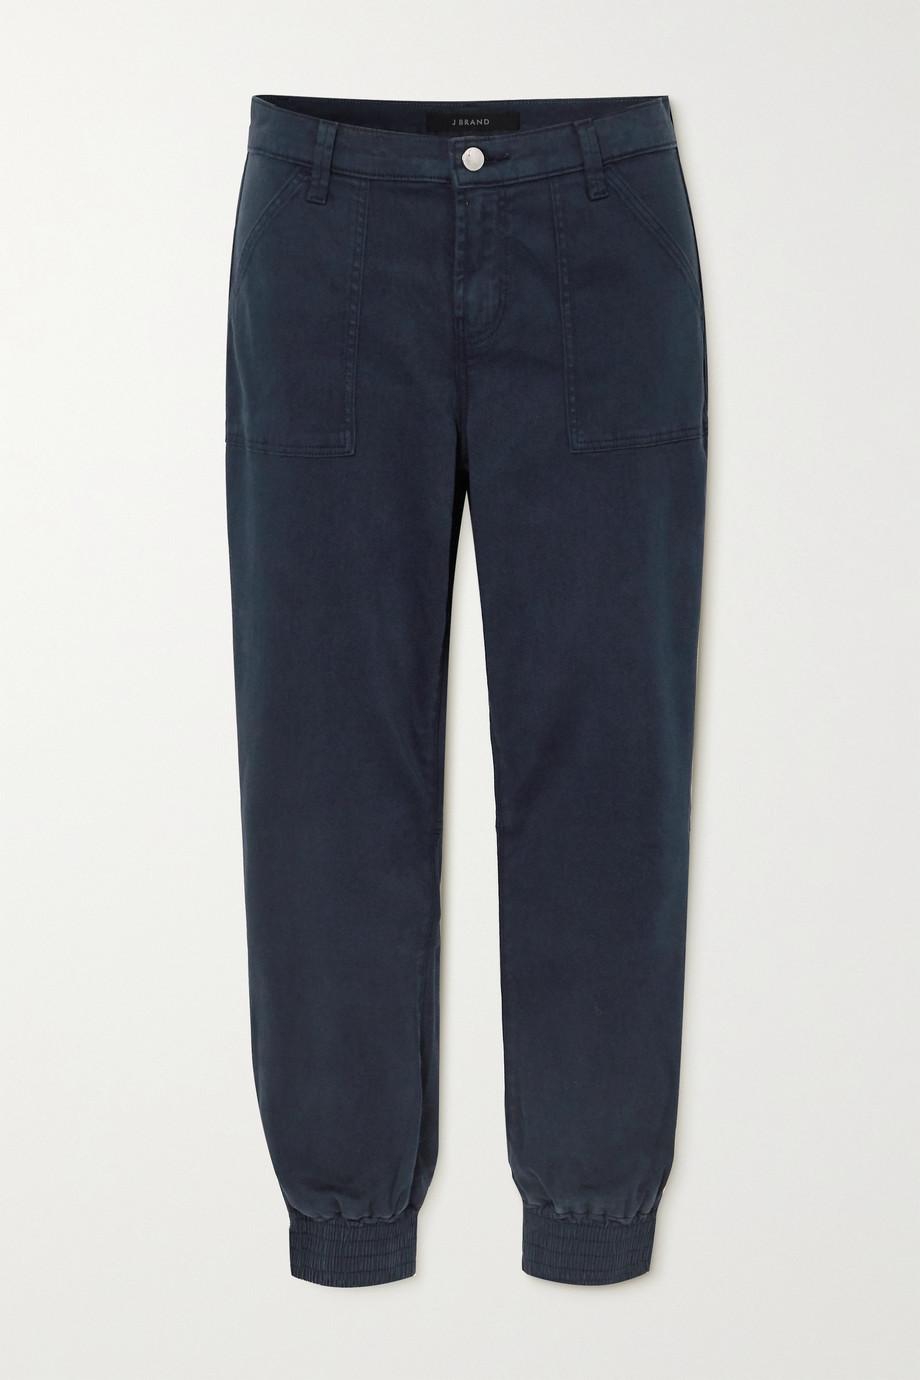 J Brand Arkin cropped cotton-blend sateen track pants